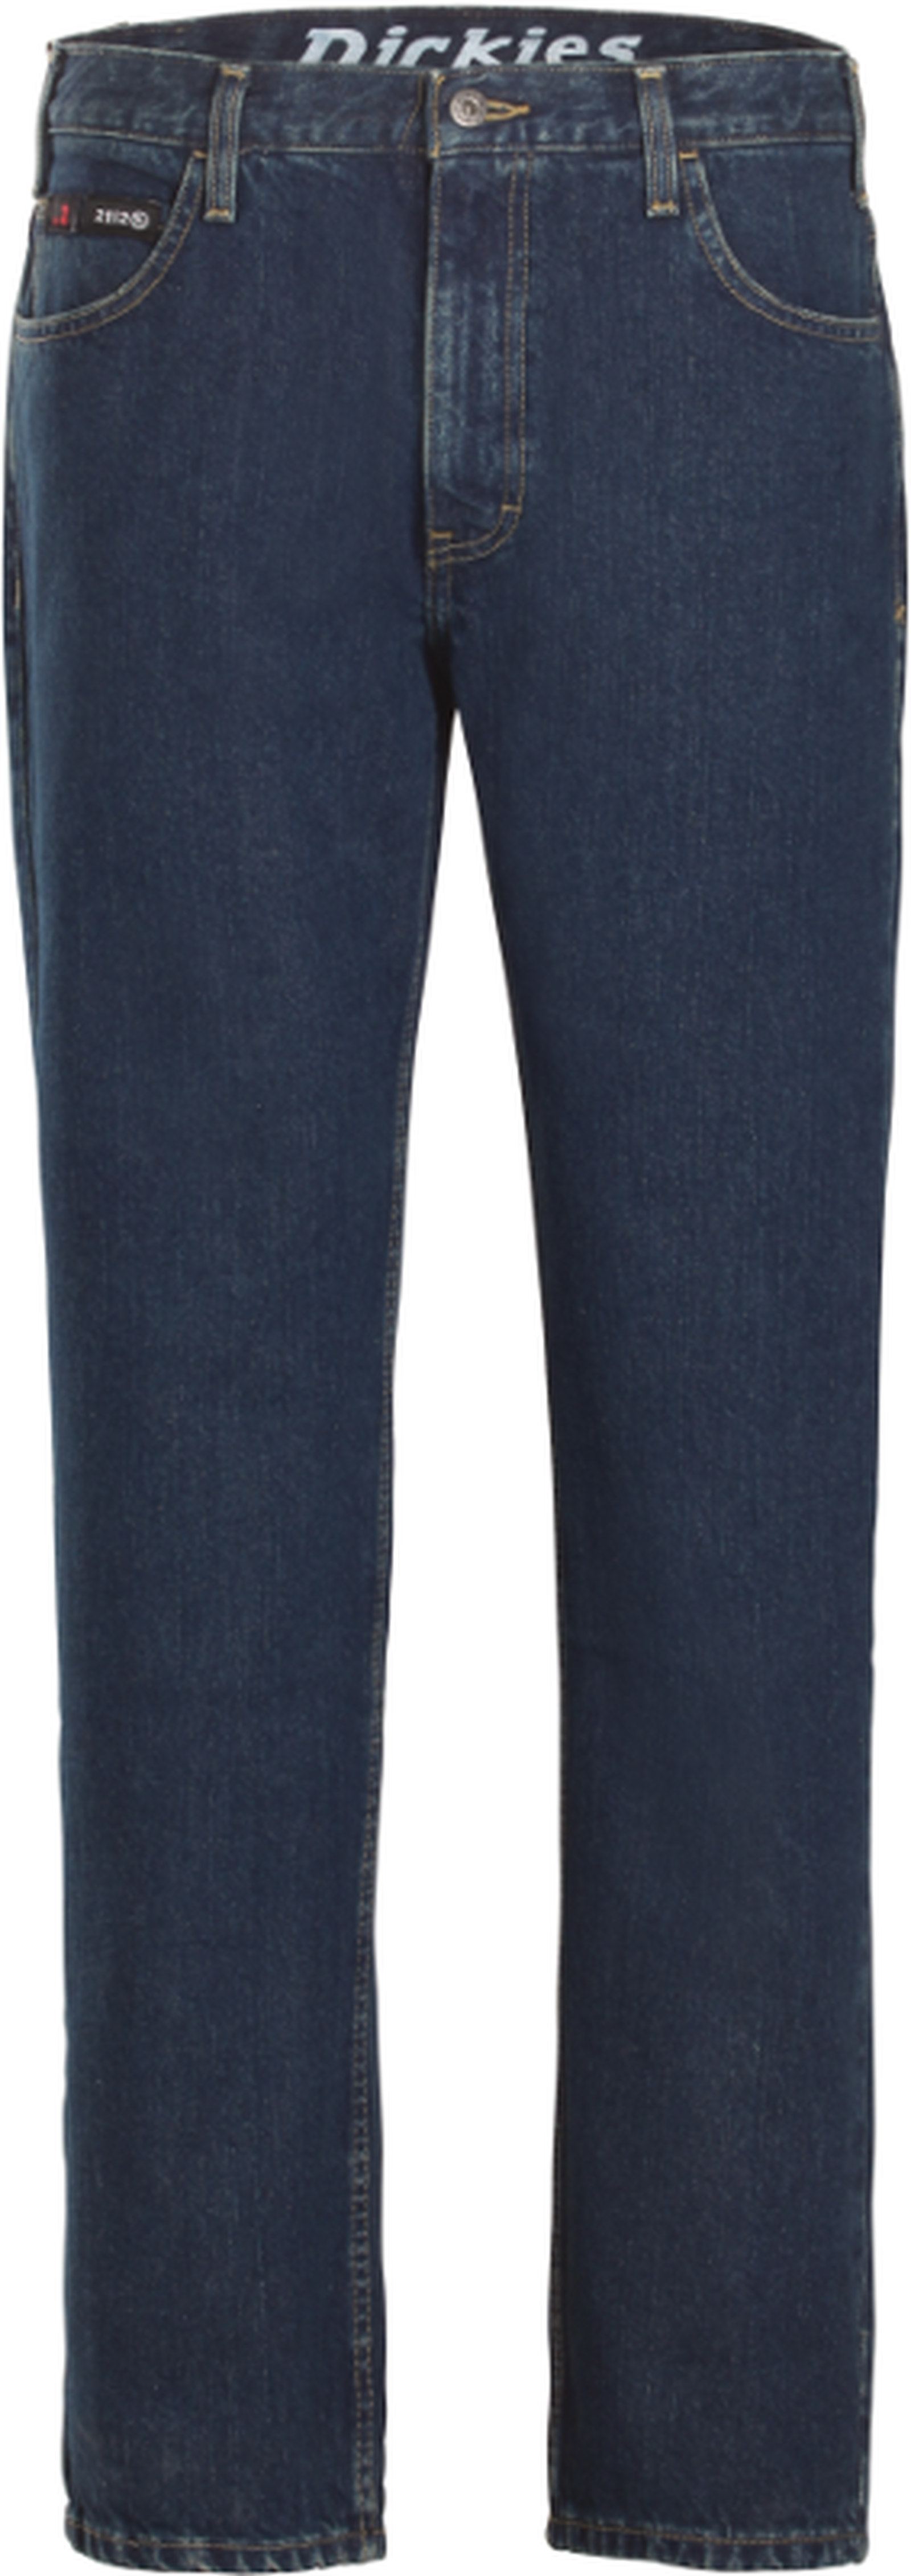 Men's FR Contemporary Five-Pocket Jean